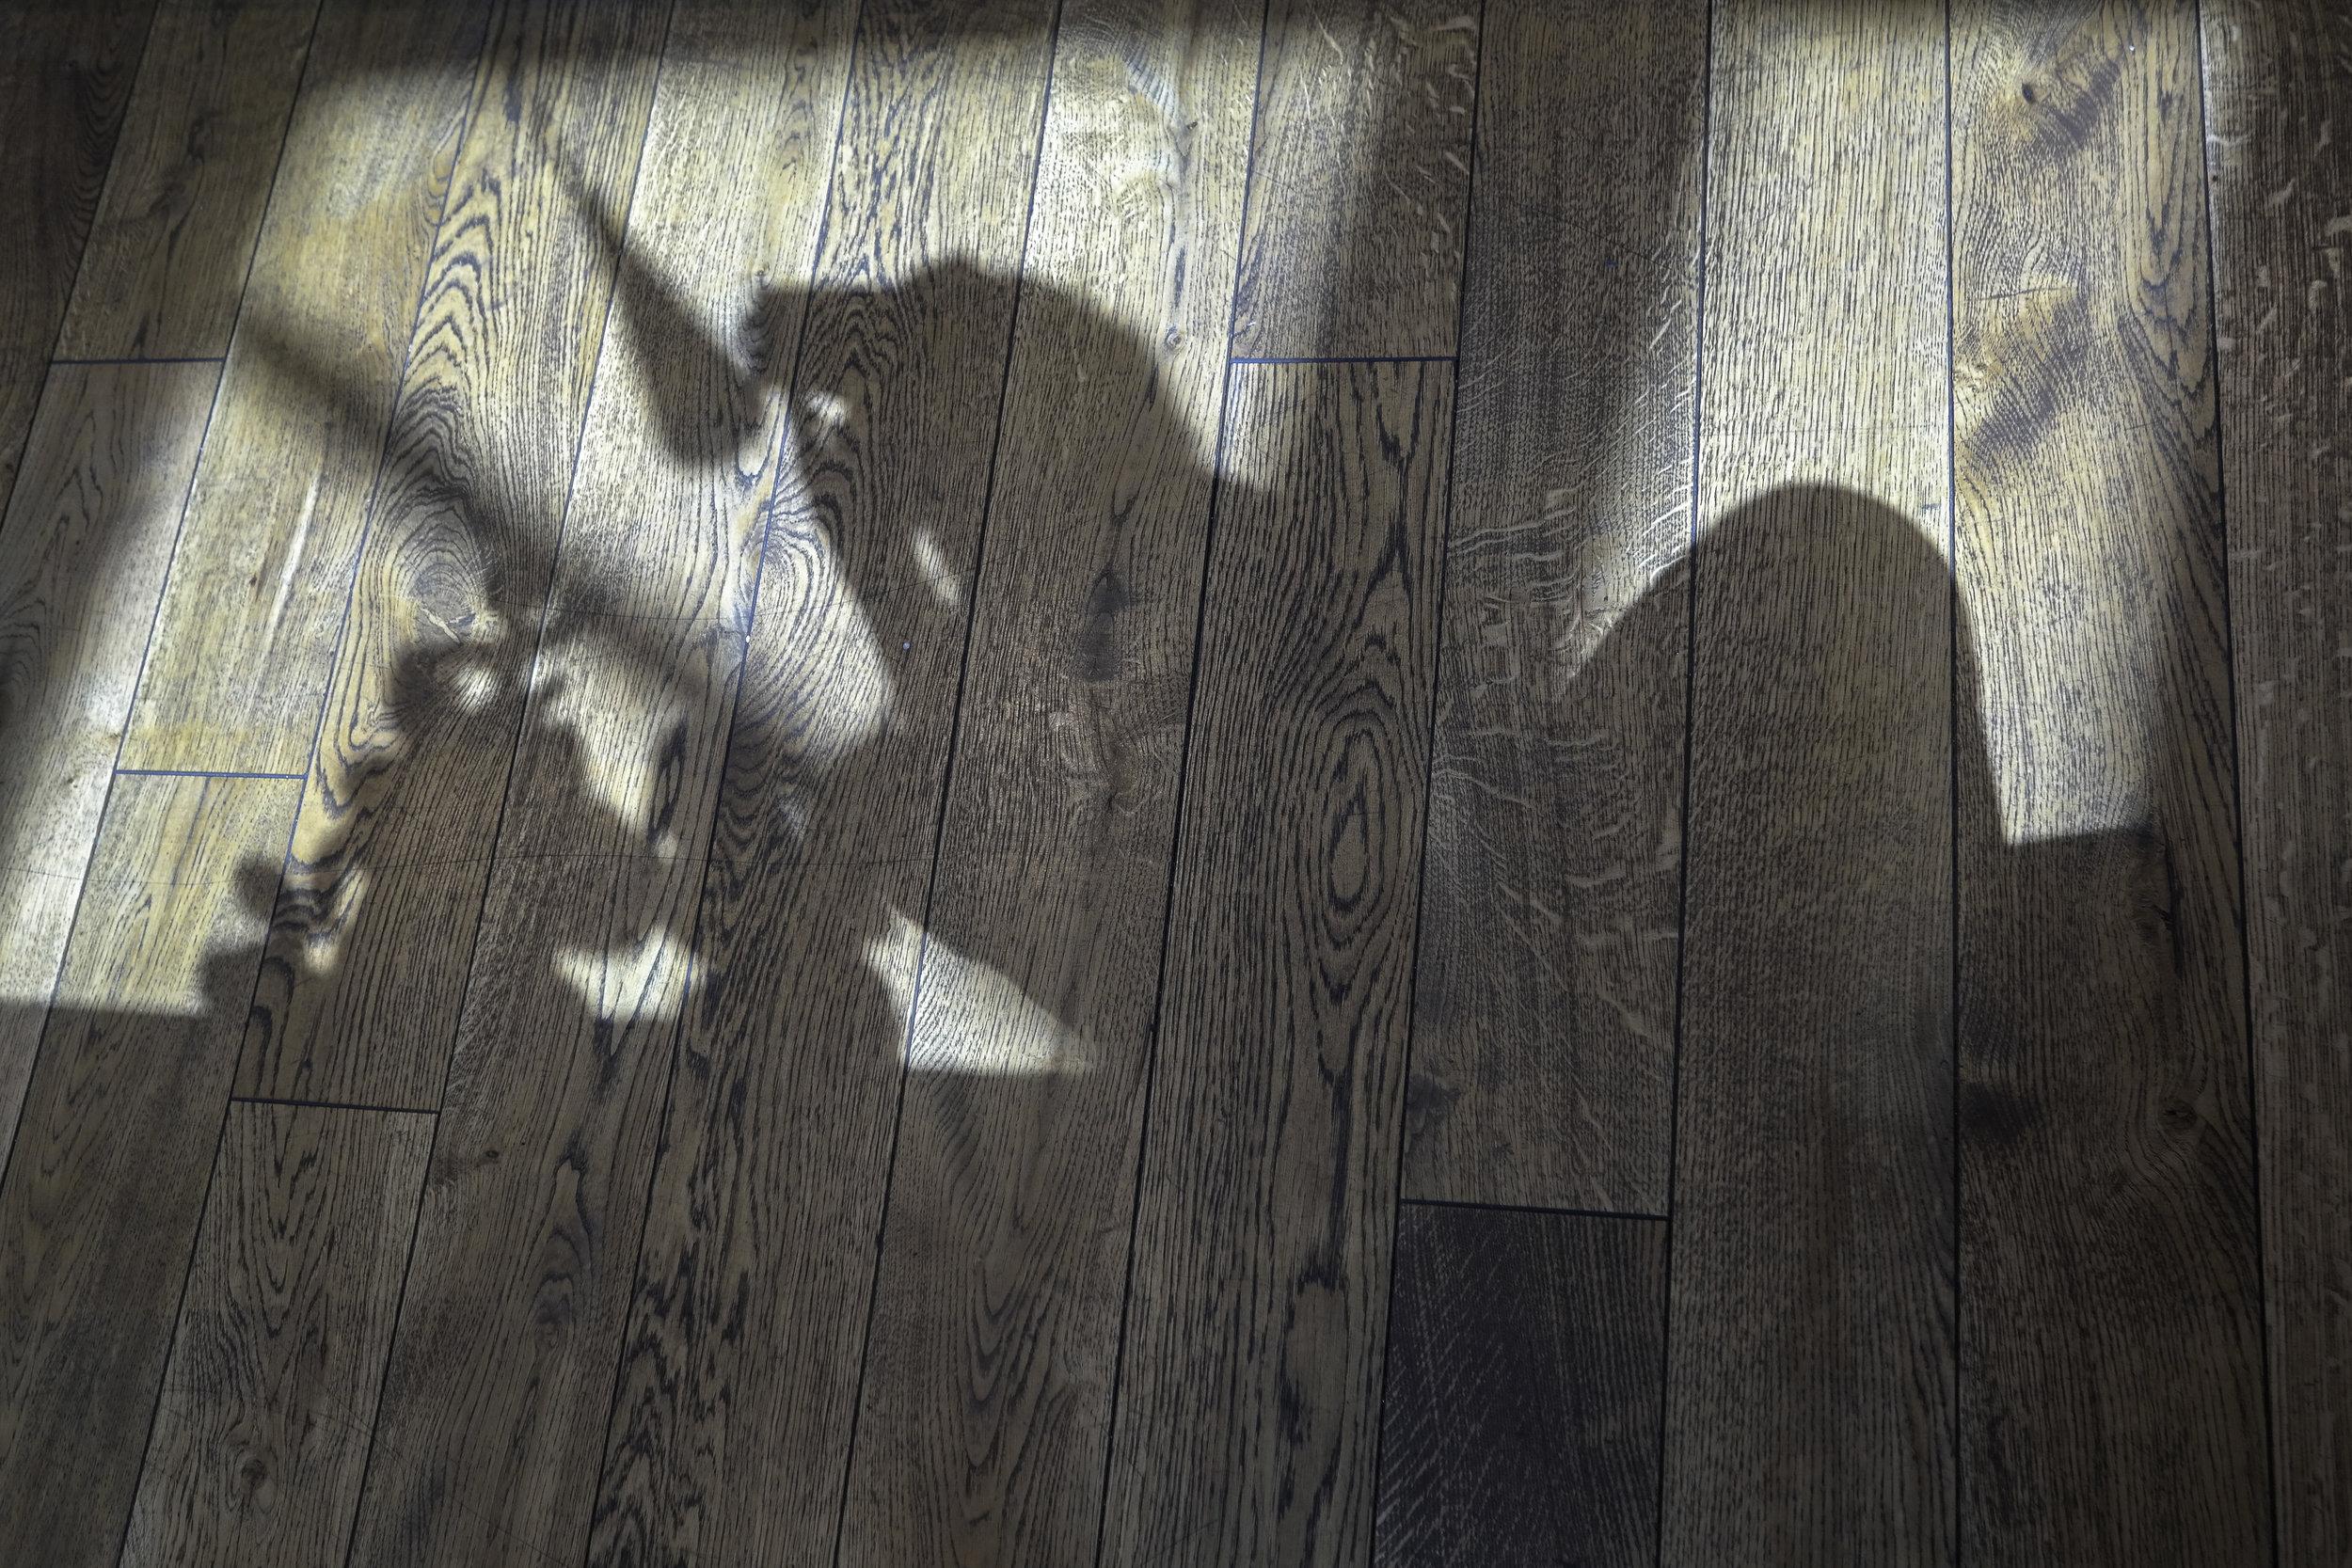 Self-shadow-photo.jpg